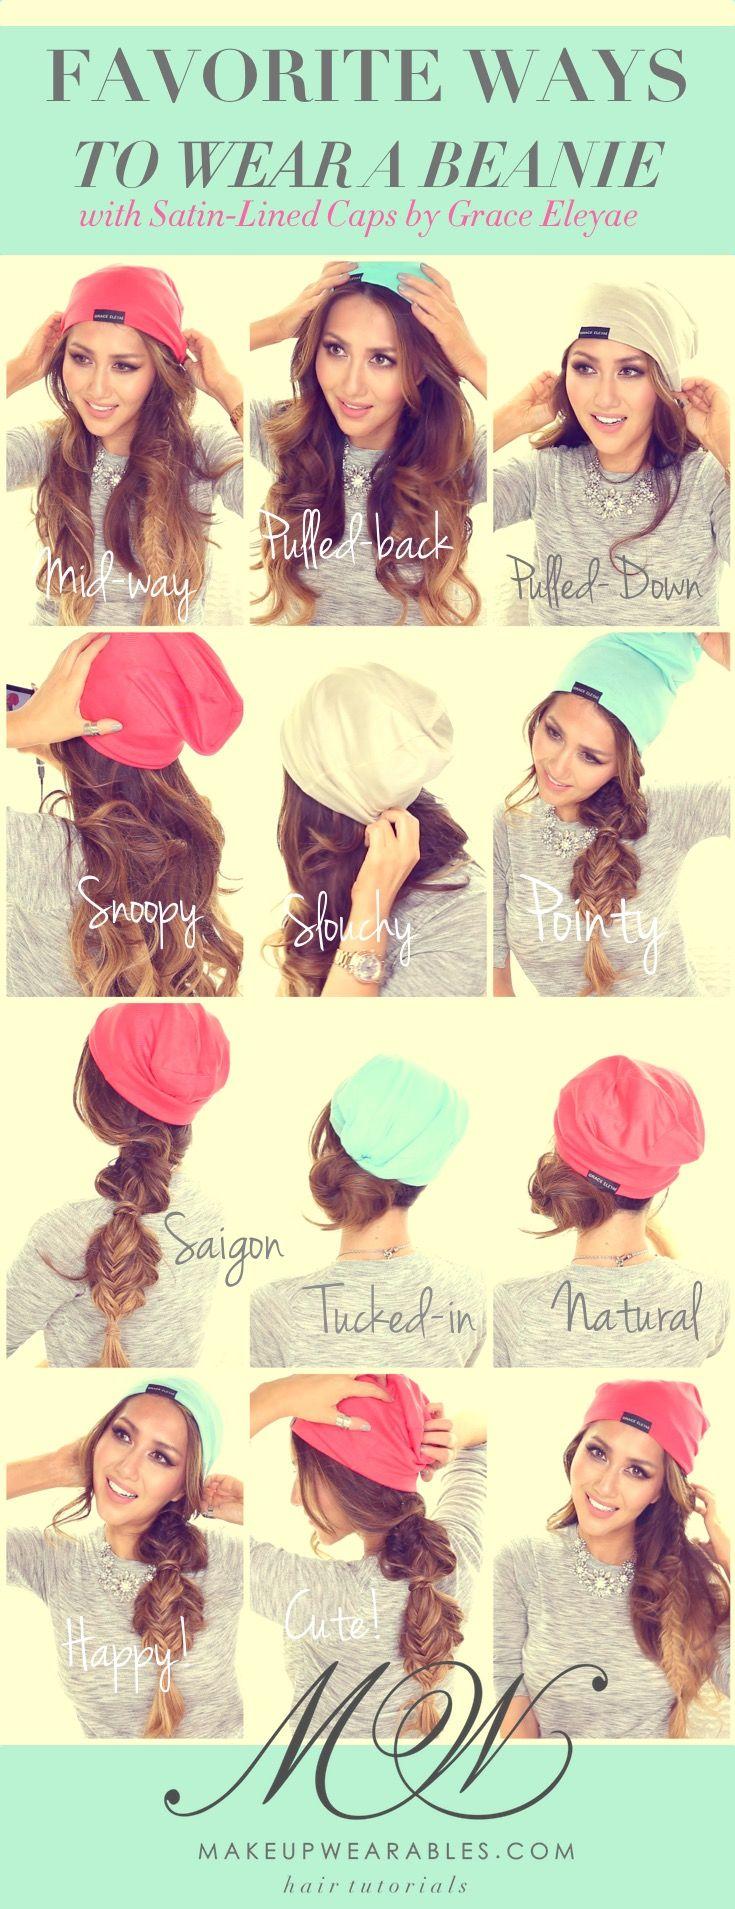 cute ways to wear a beanie - easy fall winter hairstyles | women's